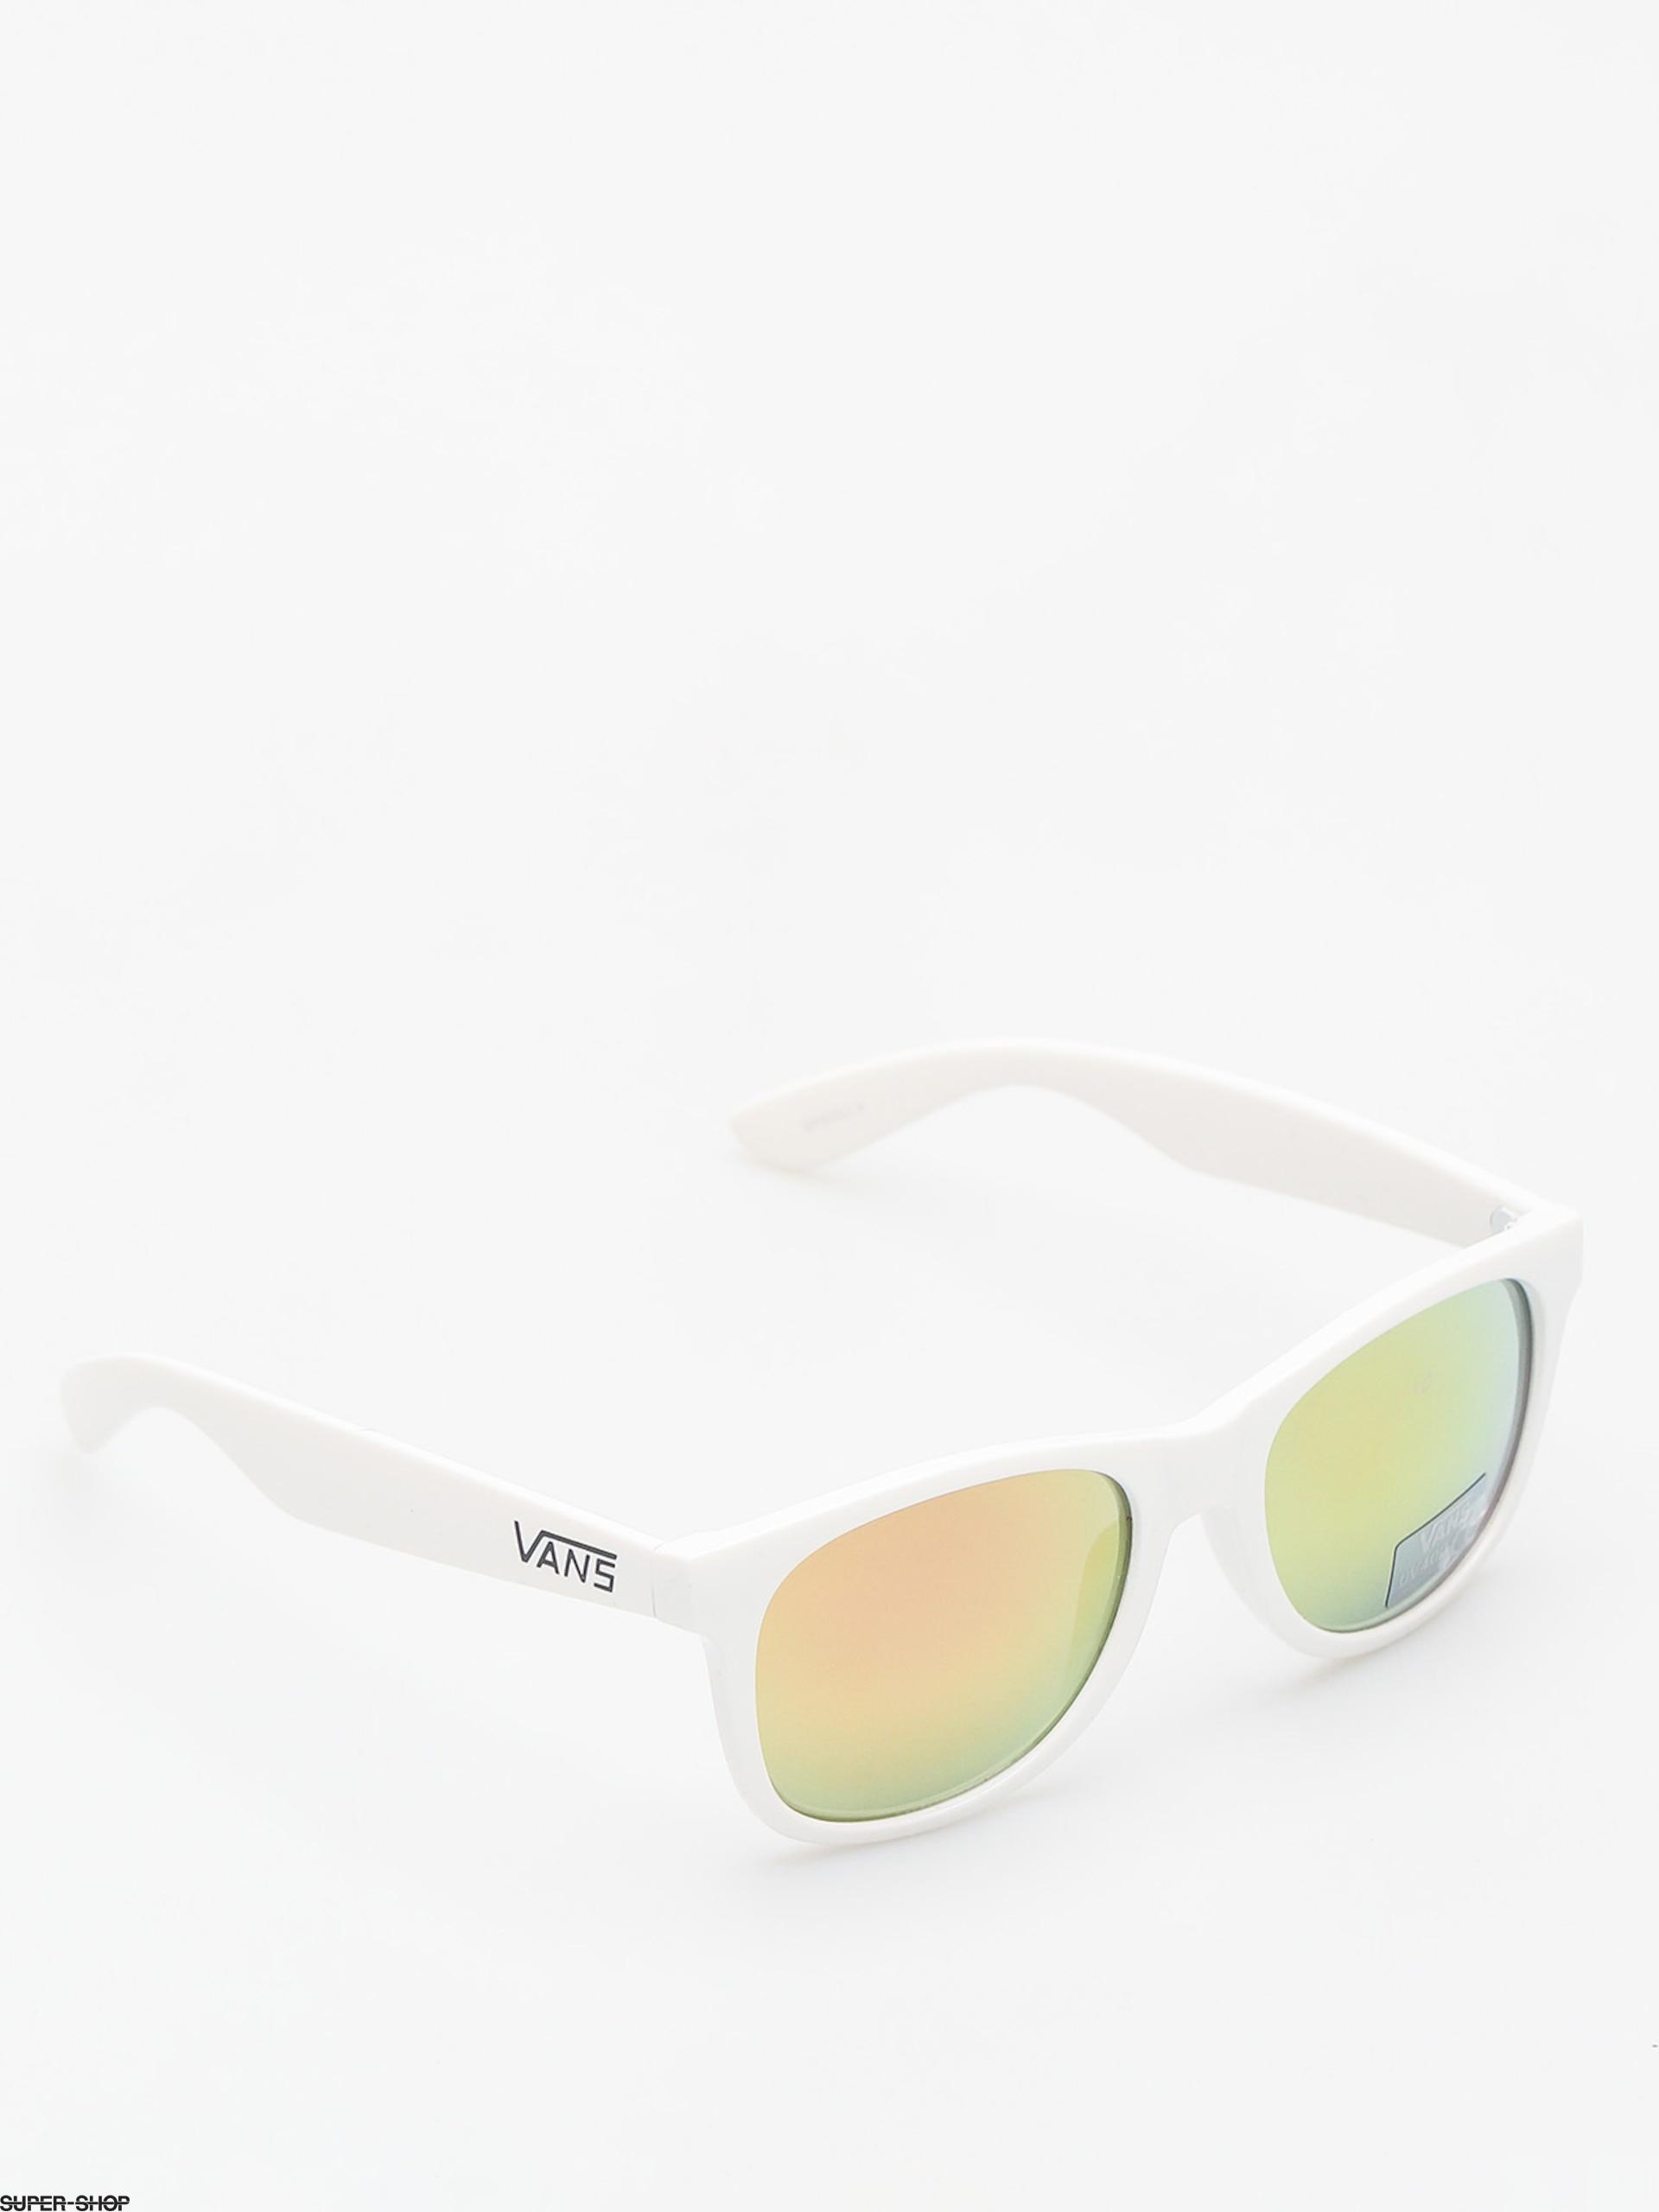 4fefaf5fc368 963719-w1920-vans-sunglasses-spicoli-4-shades-white-flame.jpg